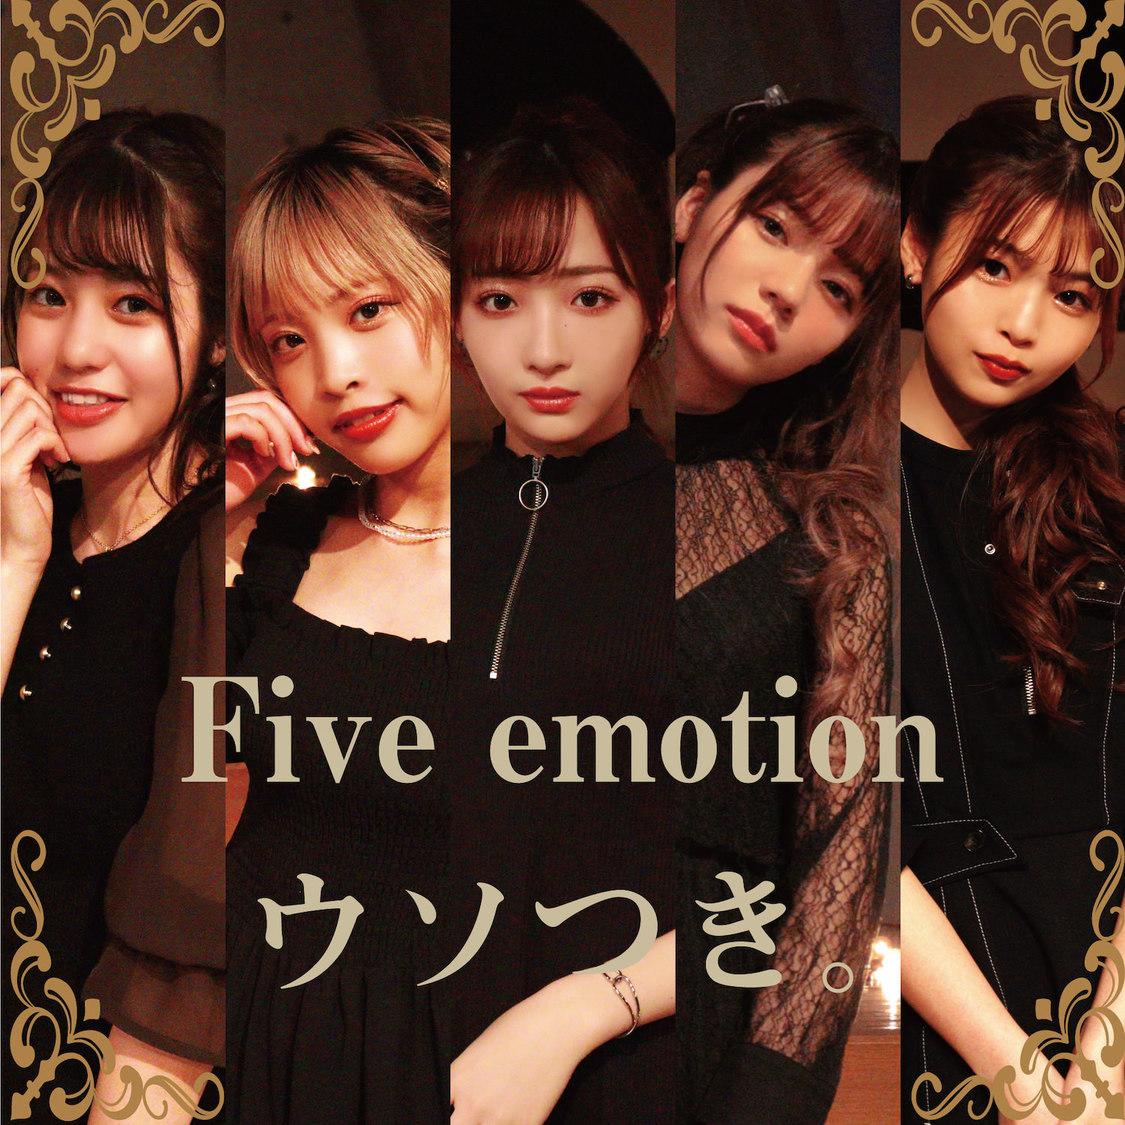 Five emotion、「ウソつき。」配信リリース&MV公開「みんなの表現力が素晴らしくて、とにかく表情を観てほしい」